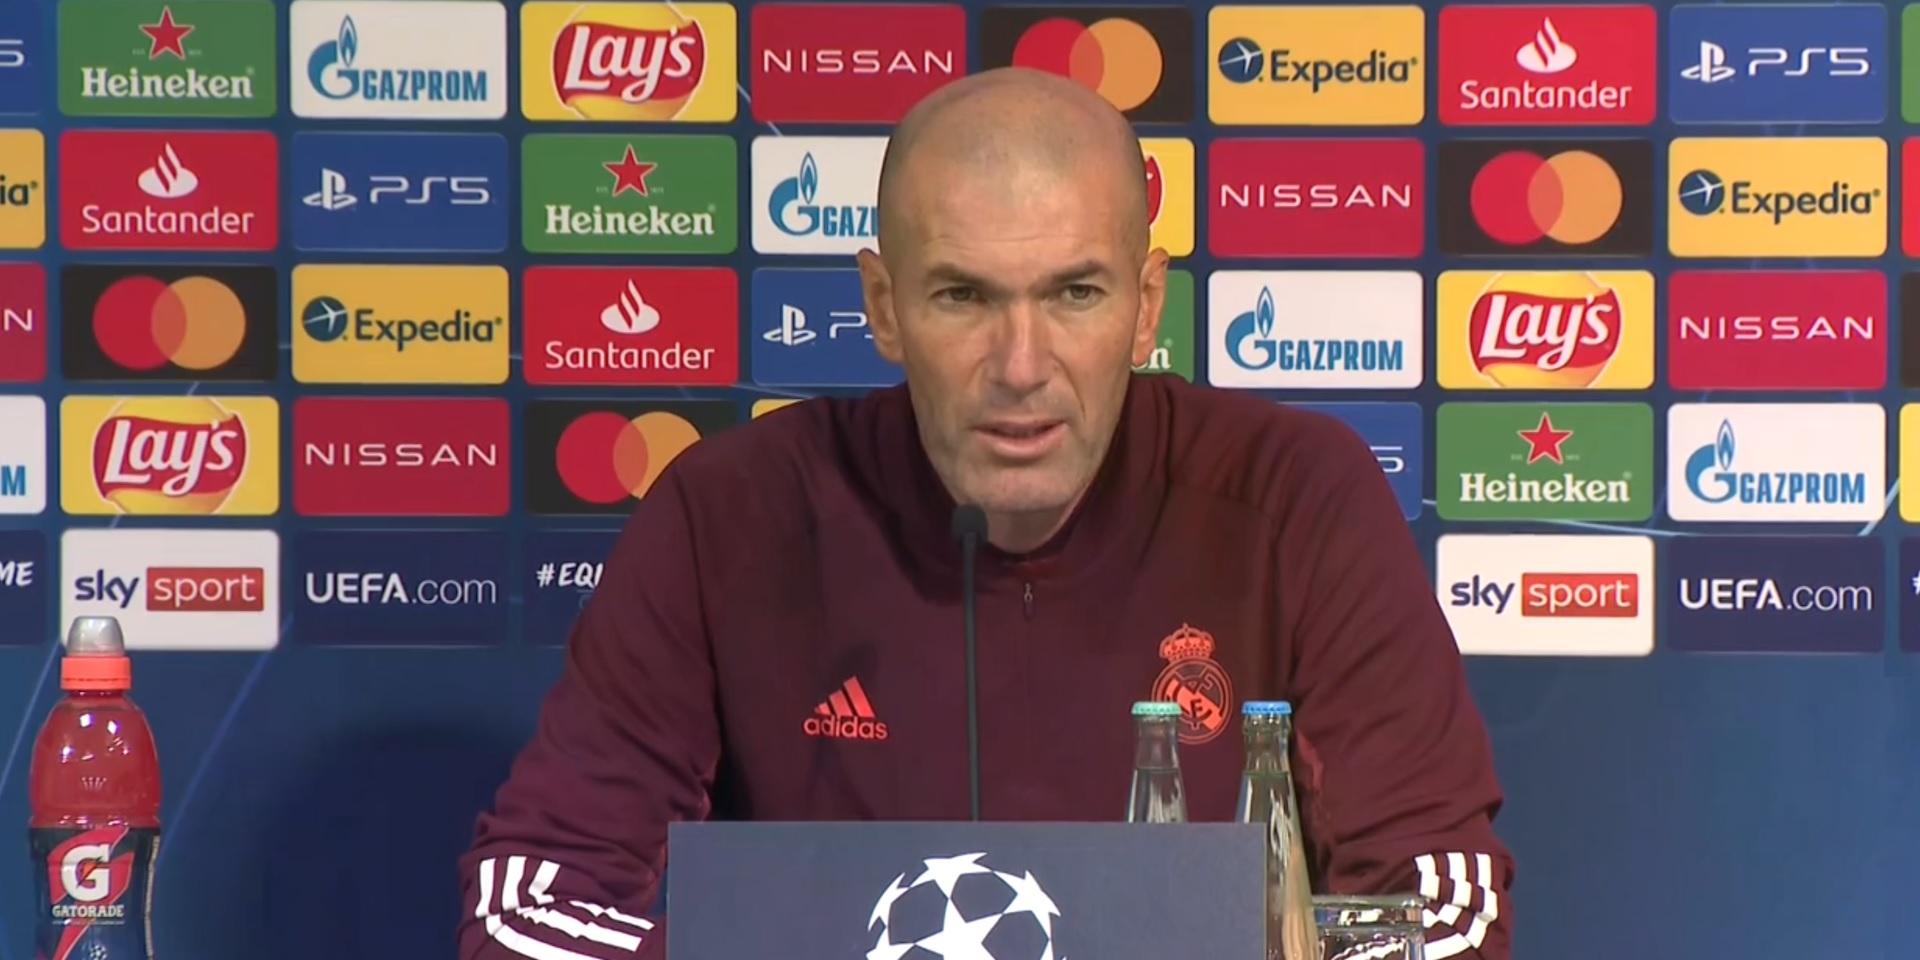 (Video) Zinedine Zidane responds to Mo Salah transfer speculation